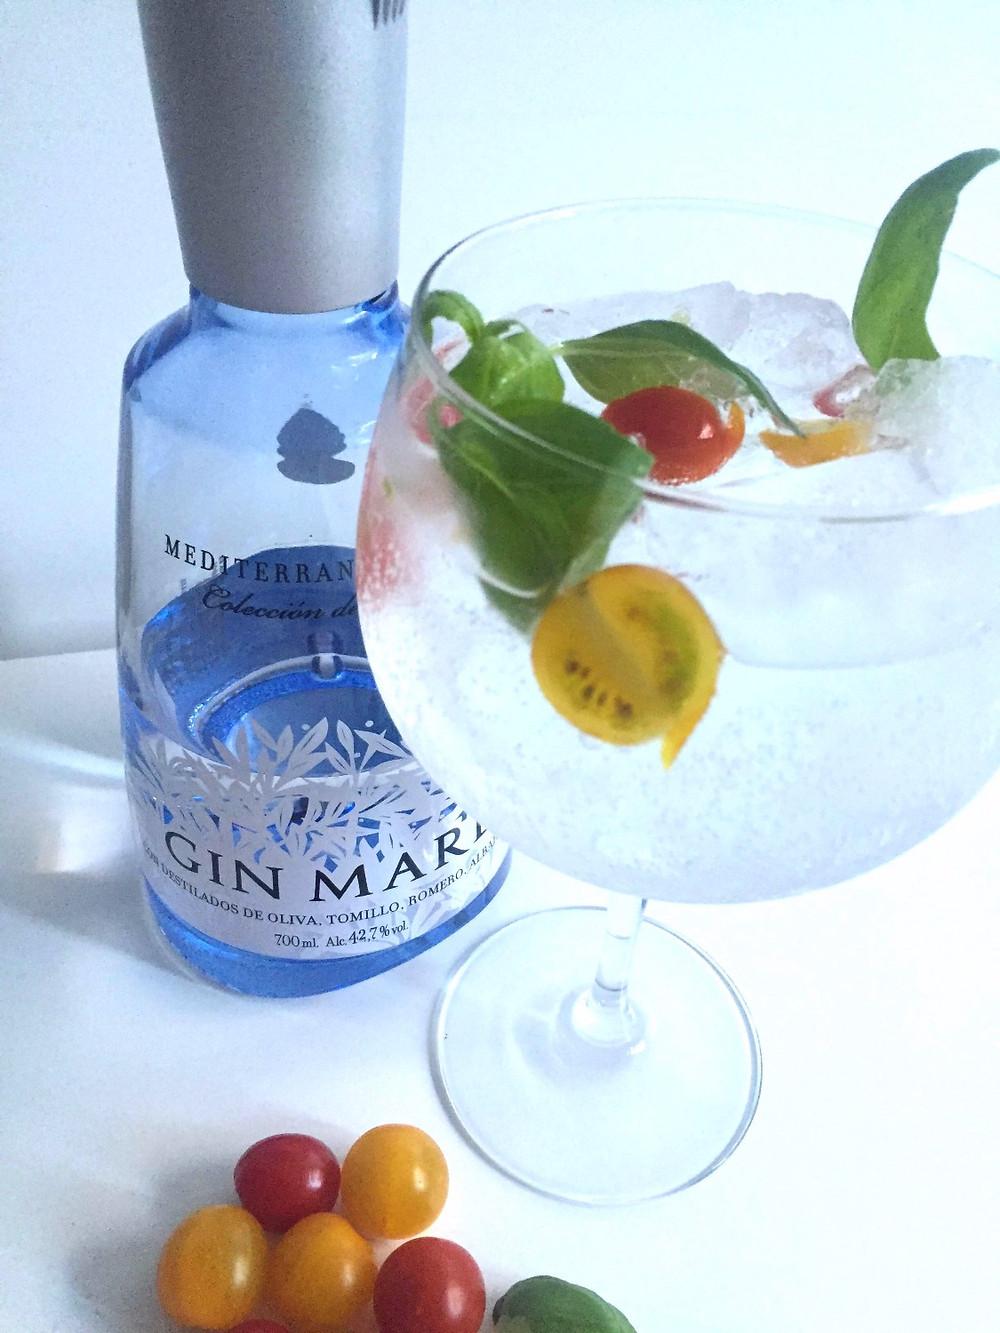 gin mare majericão tomate cherry